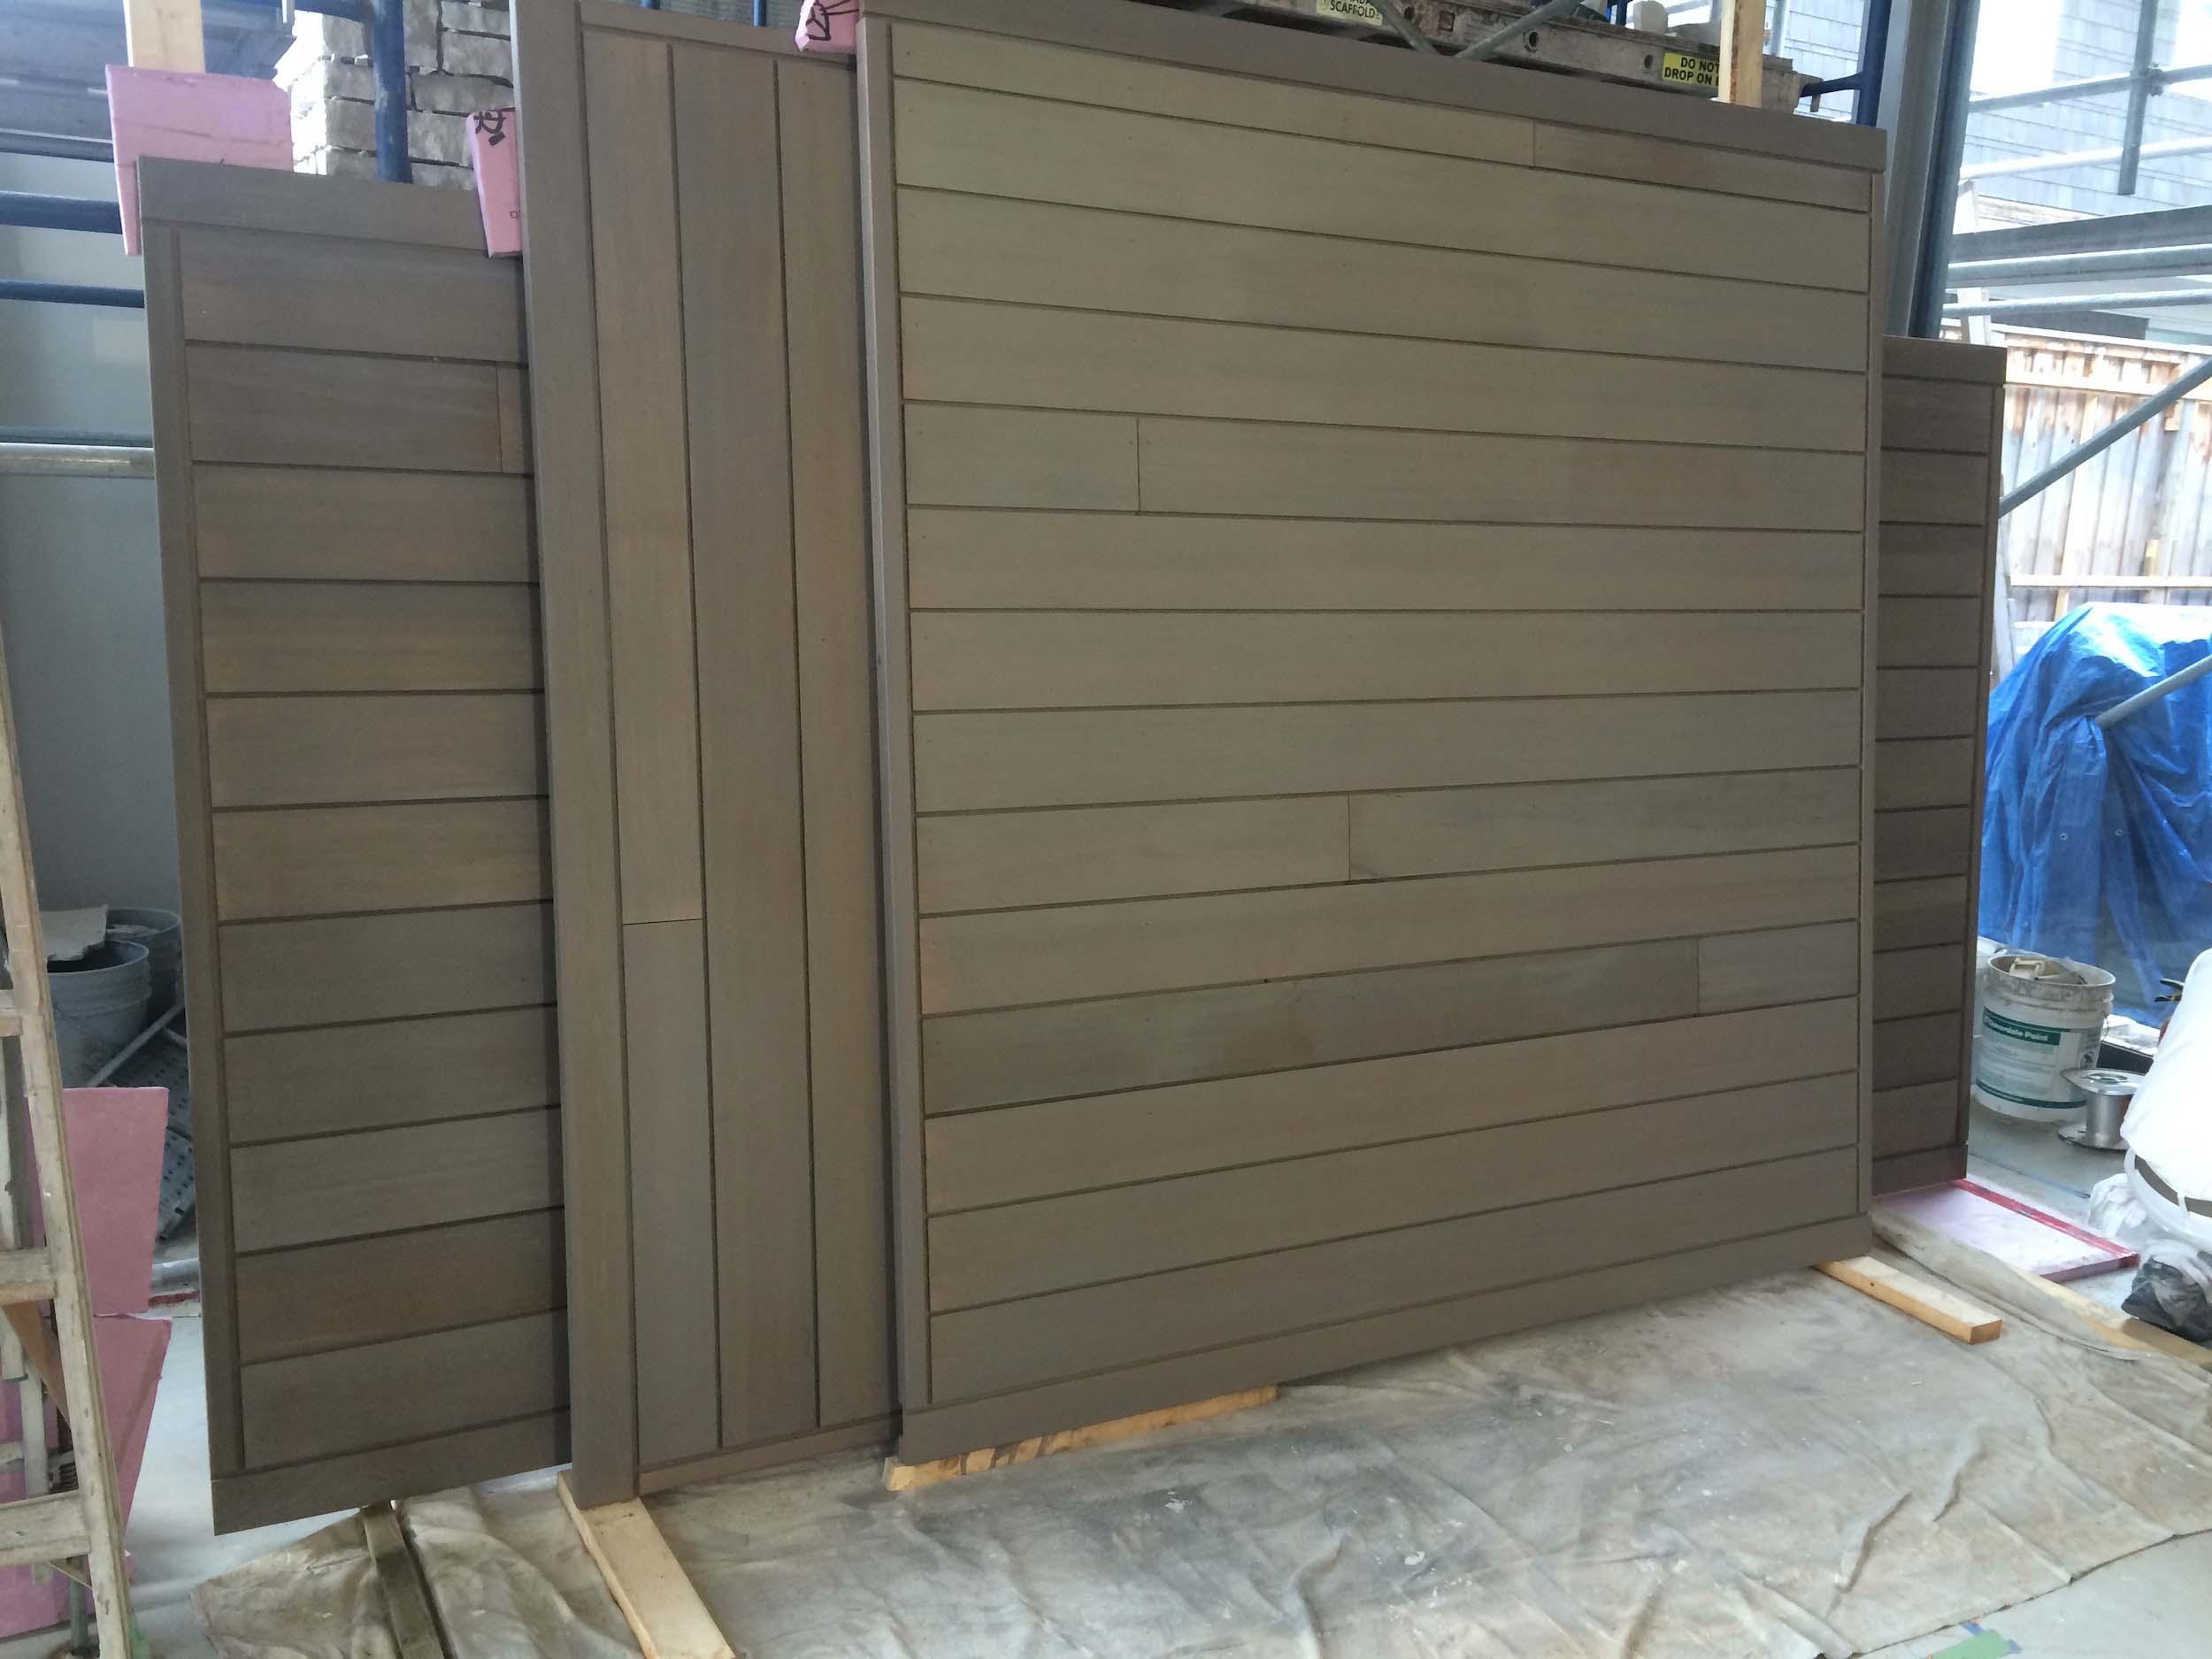 Postle_Construction_ExteriorCladding13.jpg